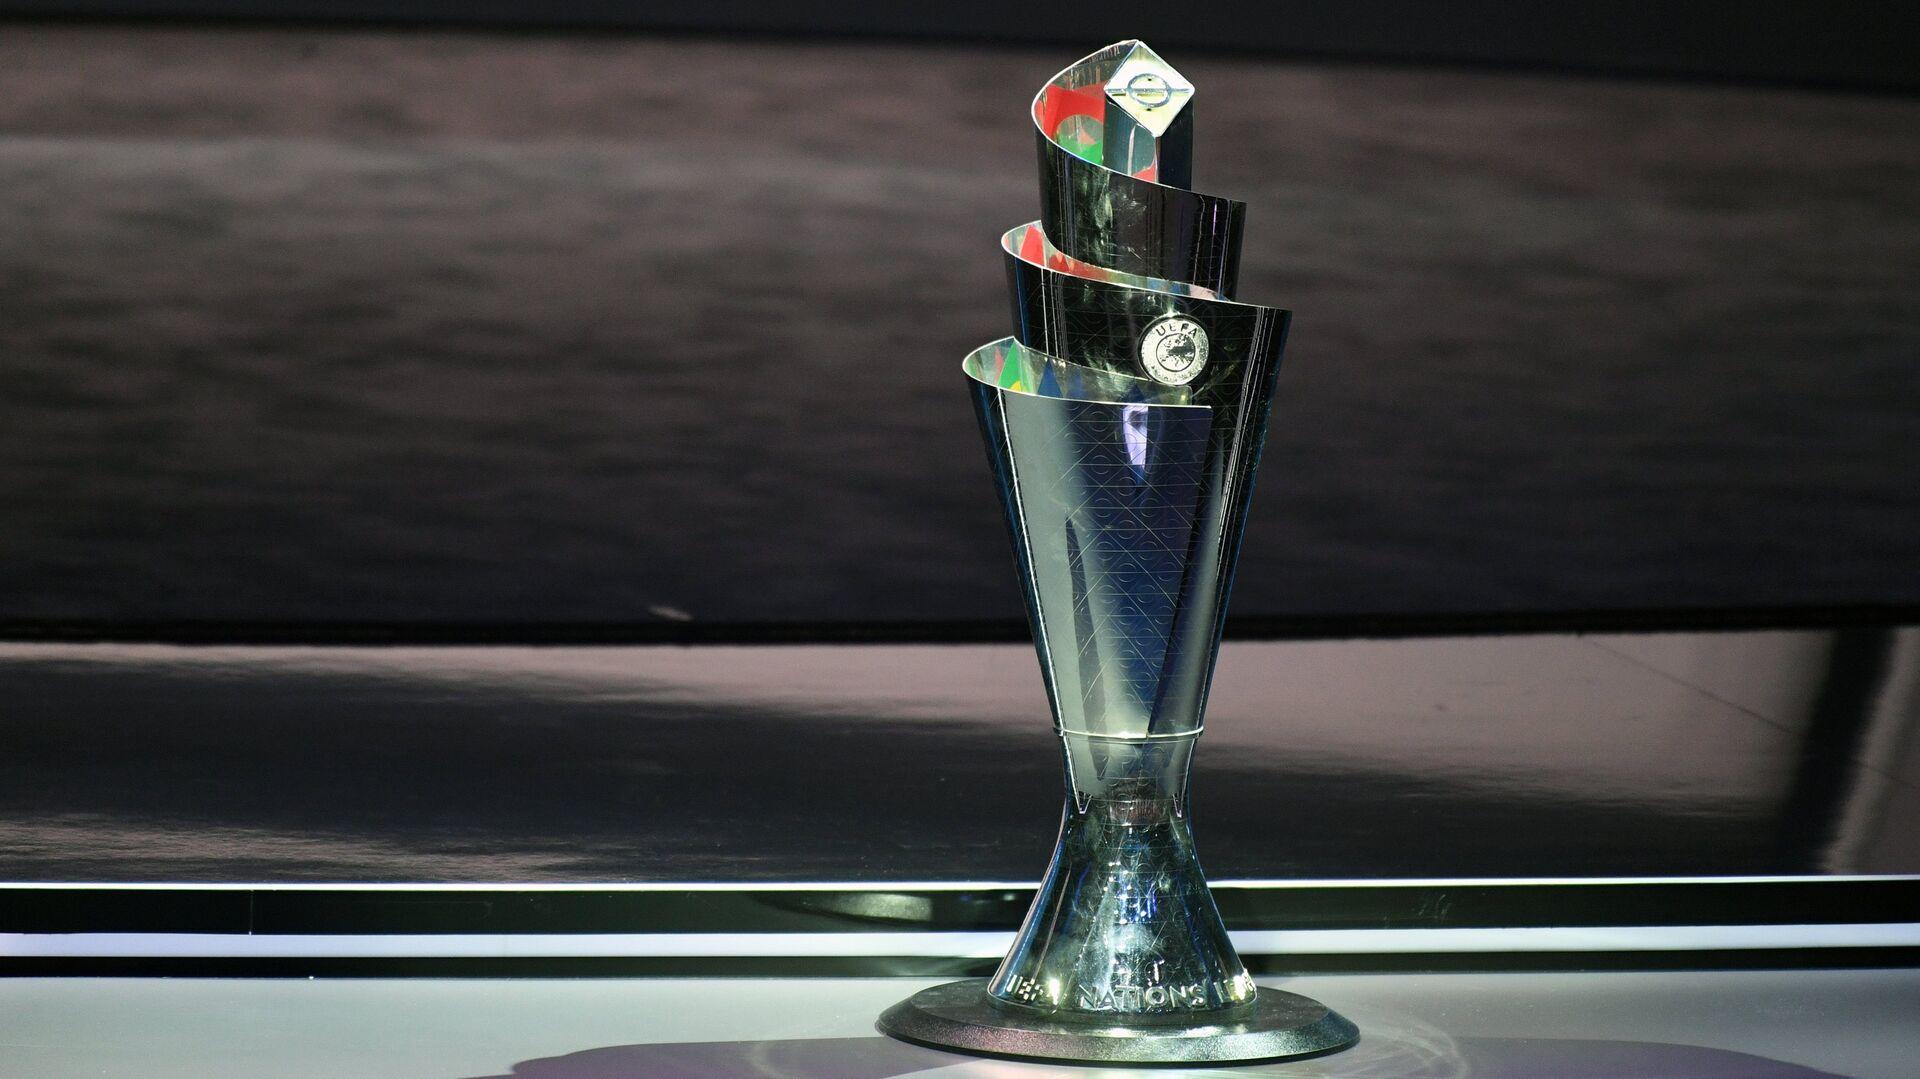 Кубок Лиги наций УЕФА - РИА Новости, 1920, 27.08.2020